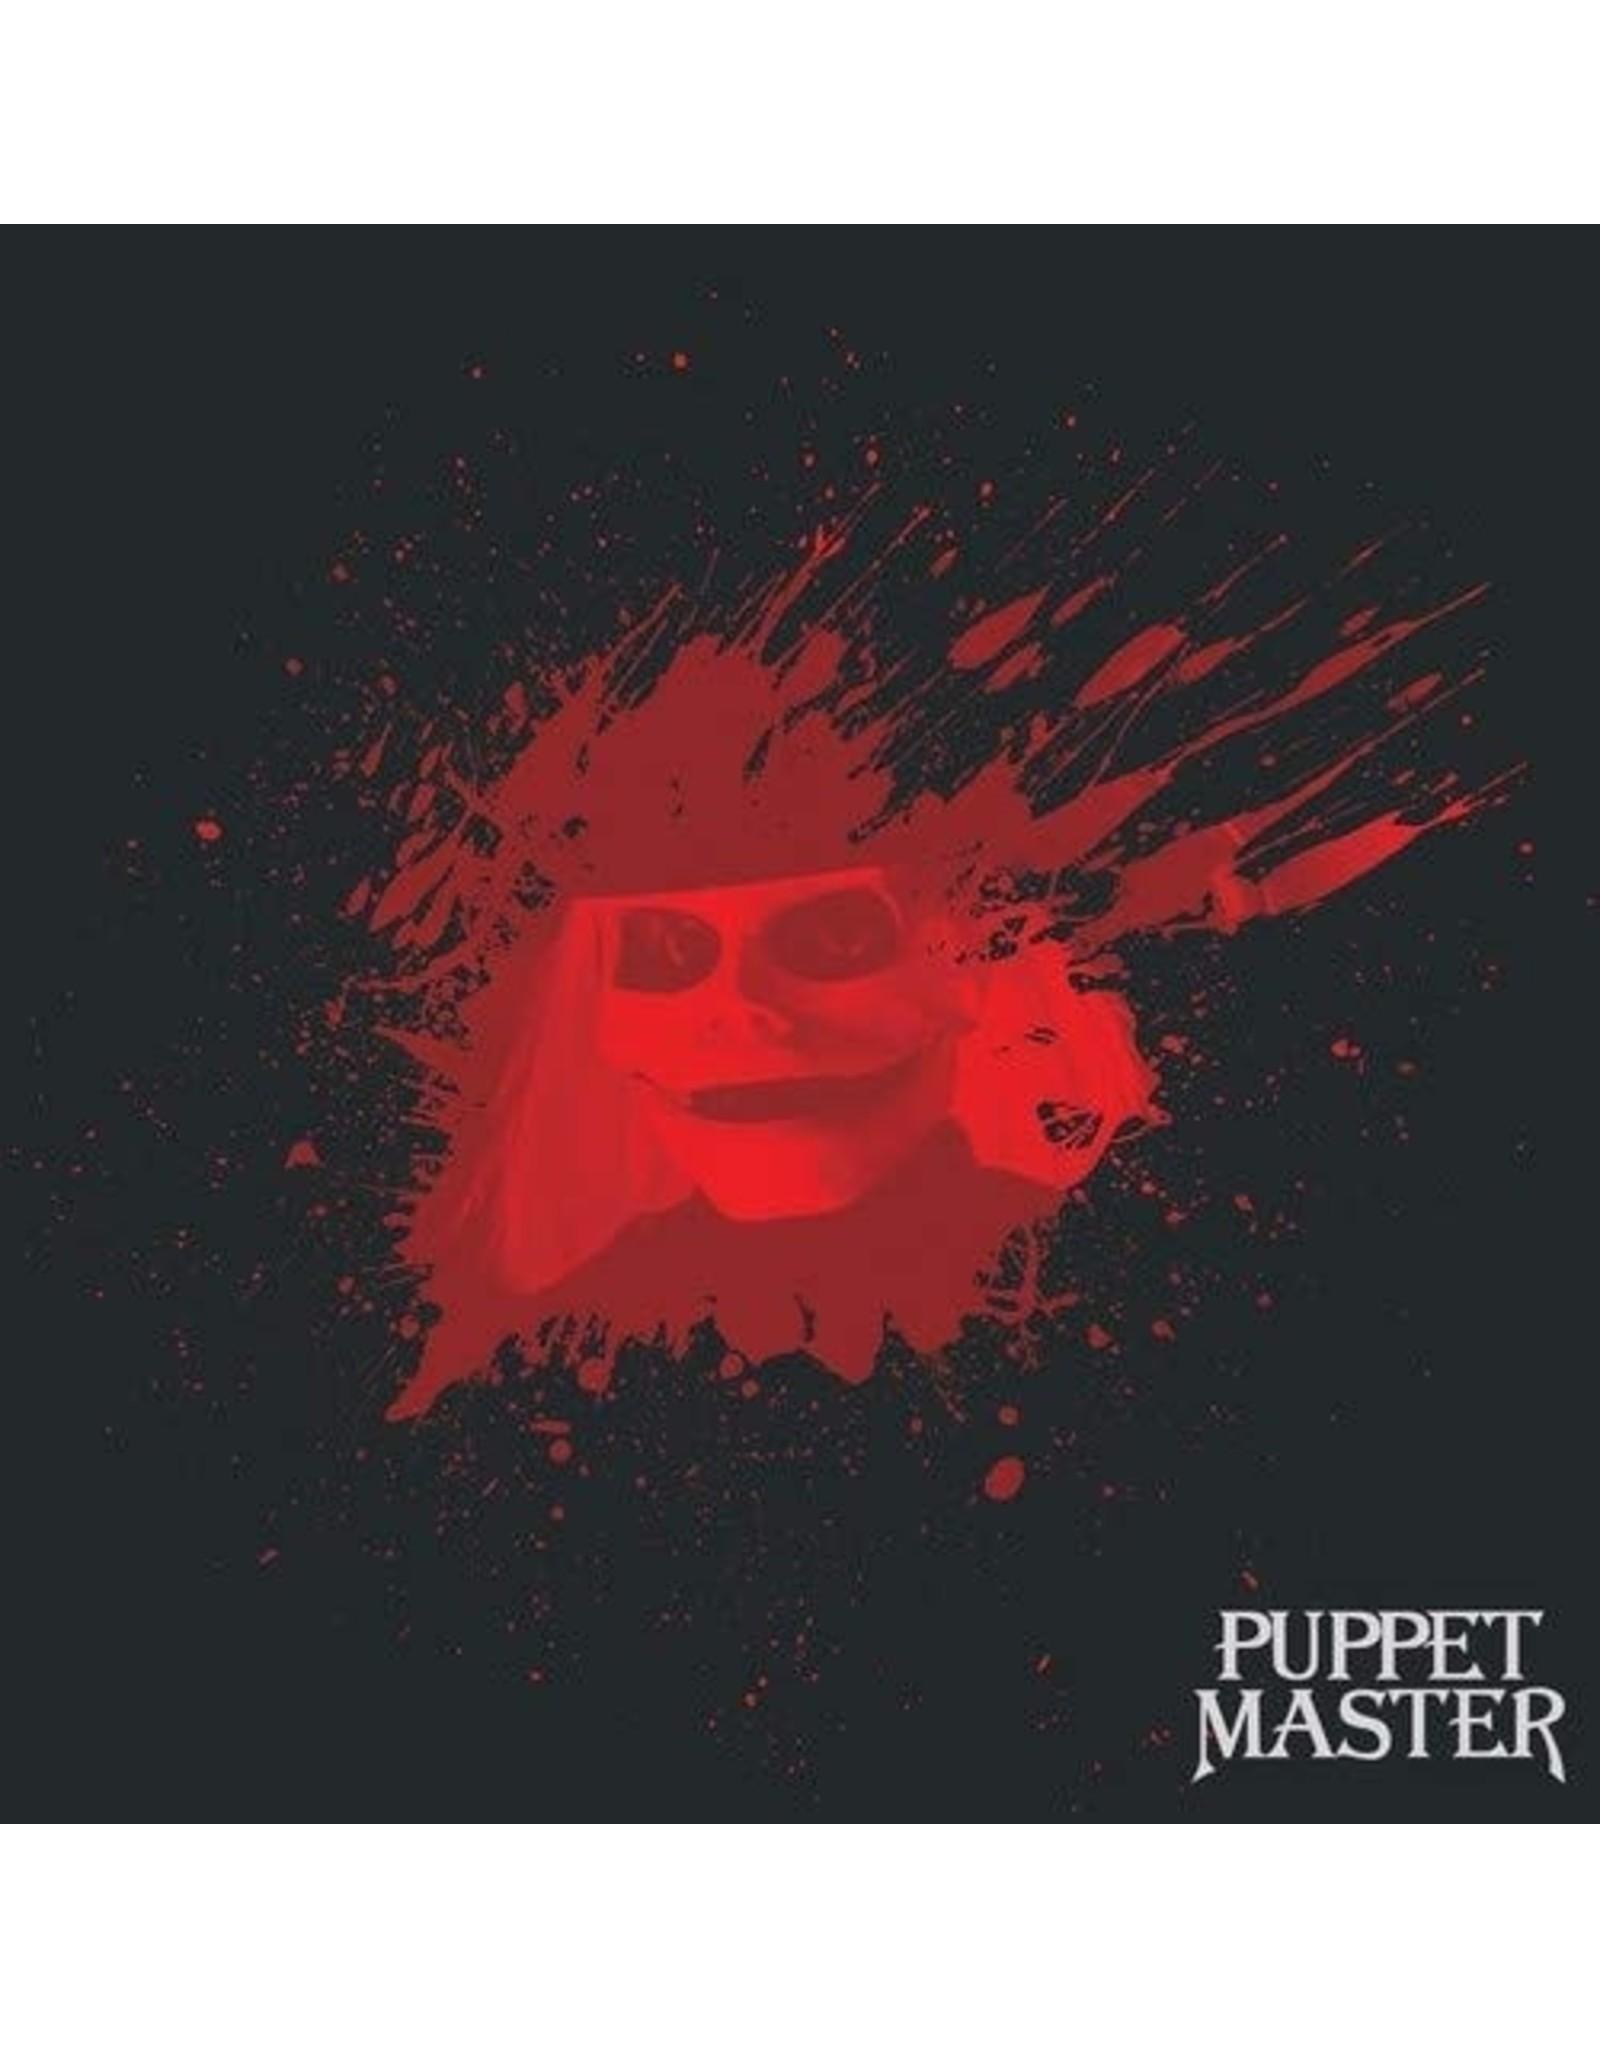 New Vinyl Richard Band - Puppet Master OST LP